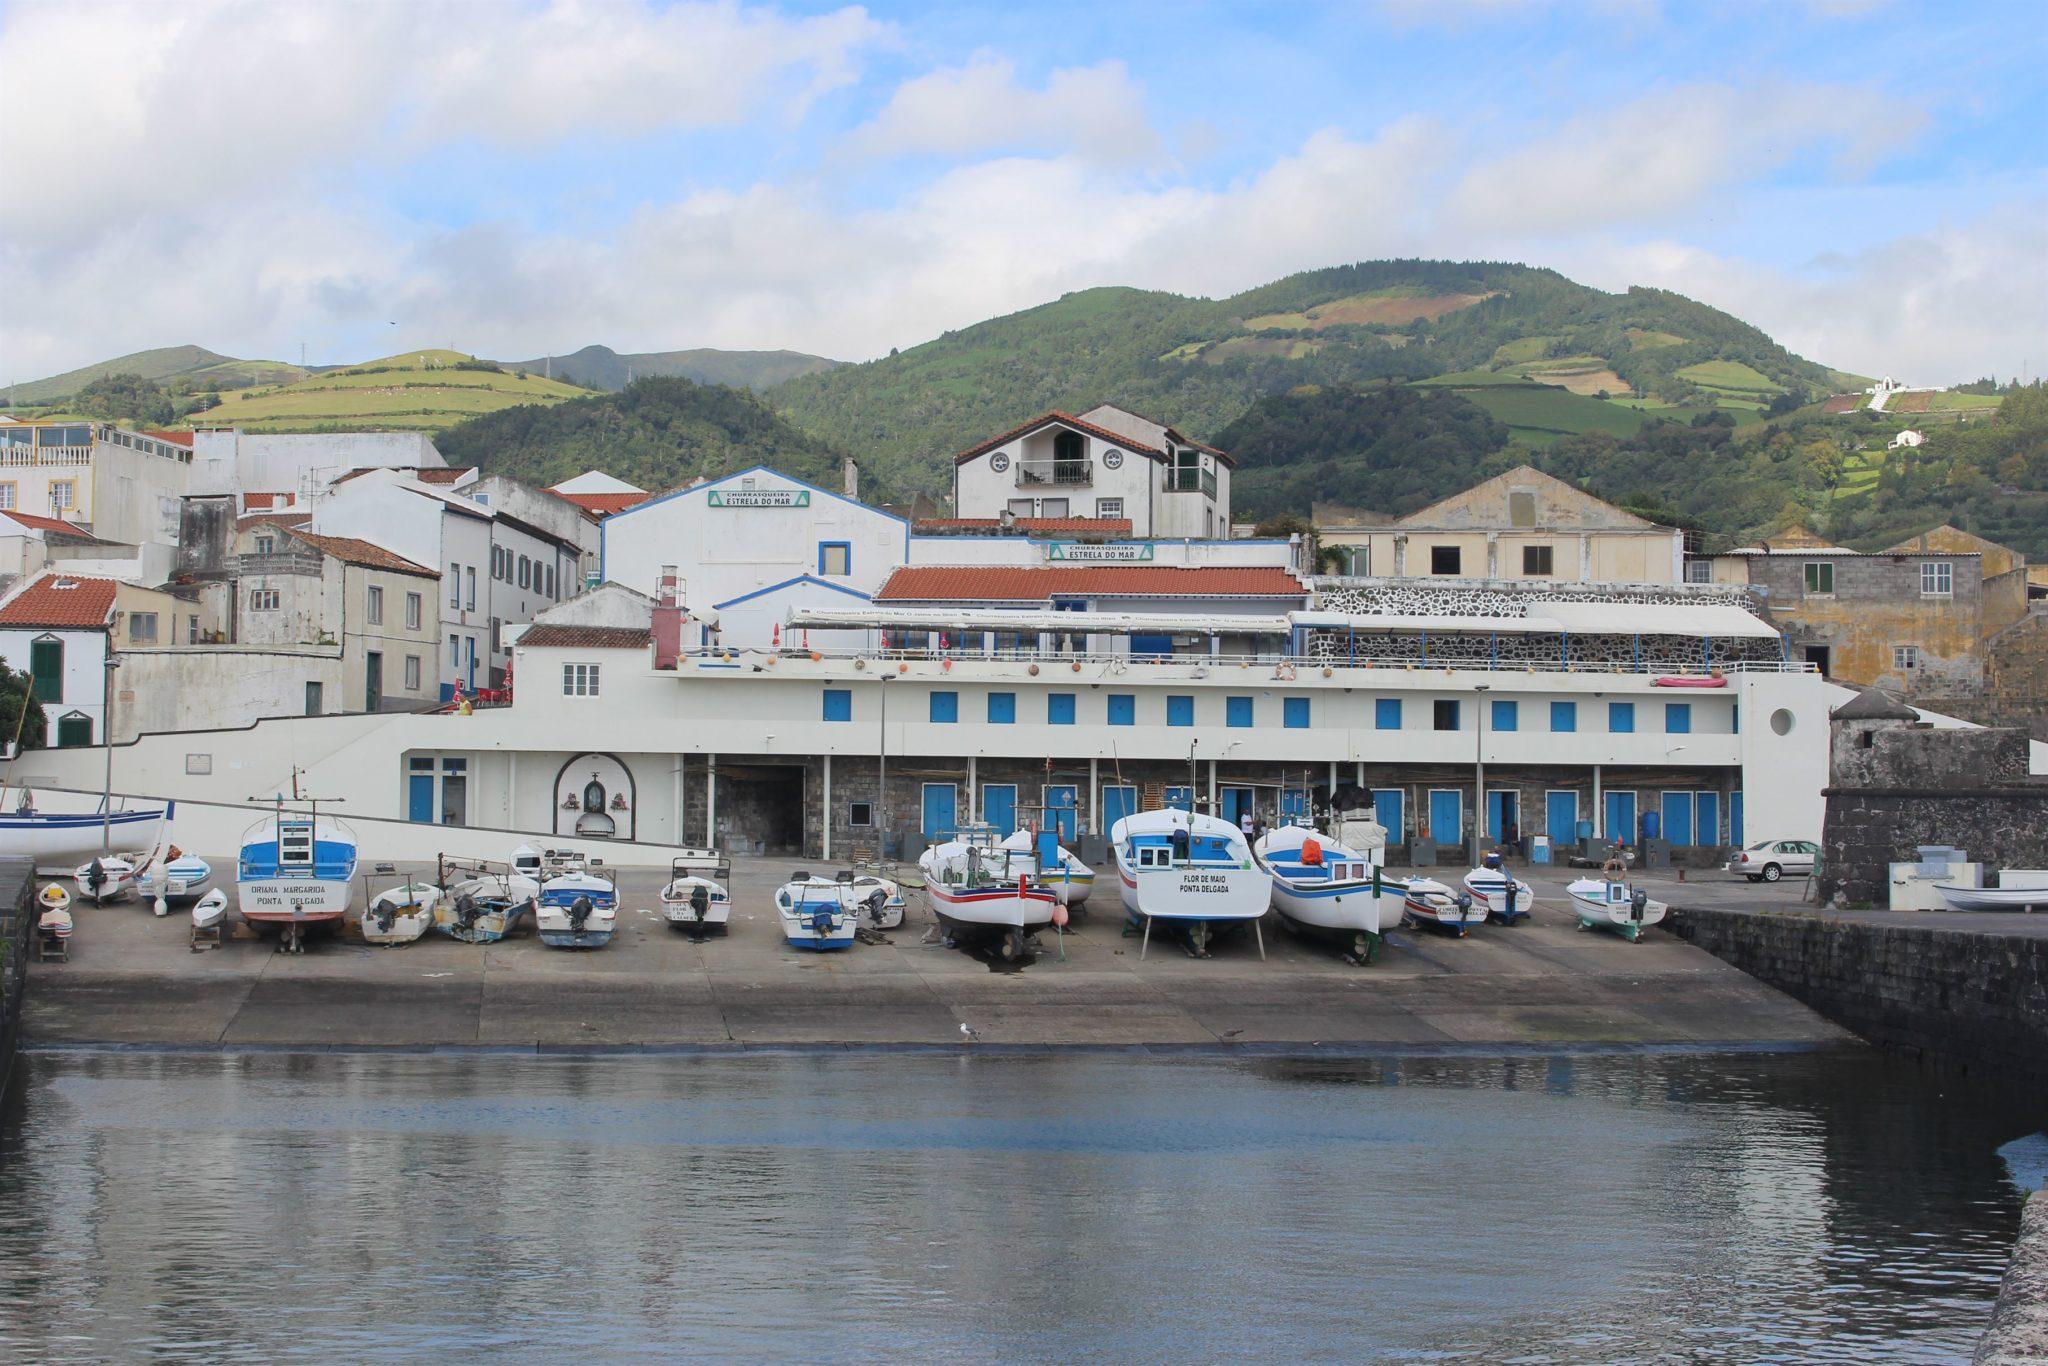 Vila Franca do Campo, S. Miguel, Açores